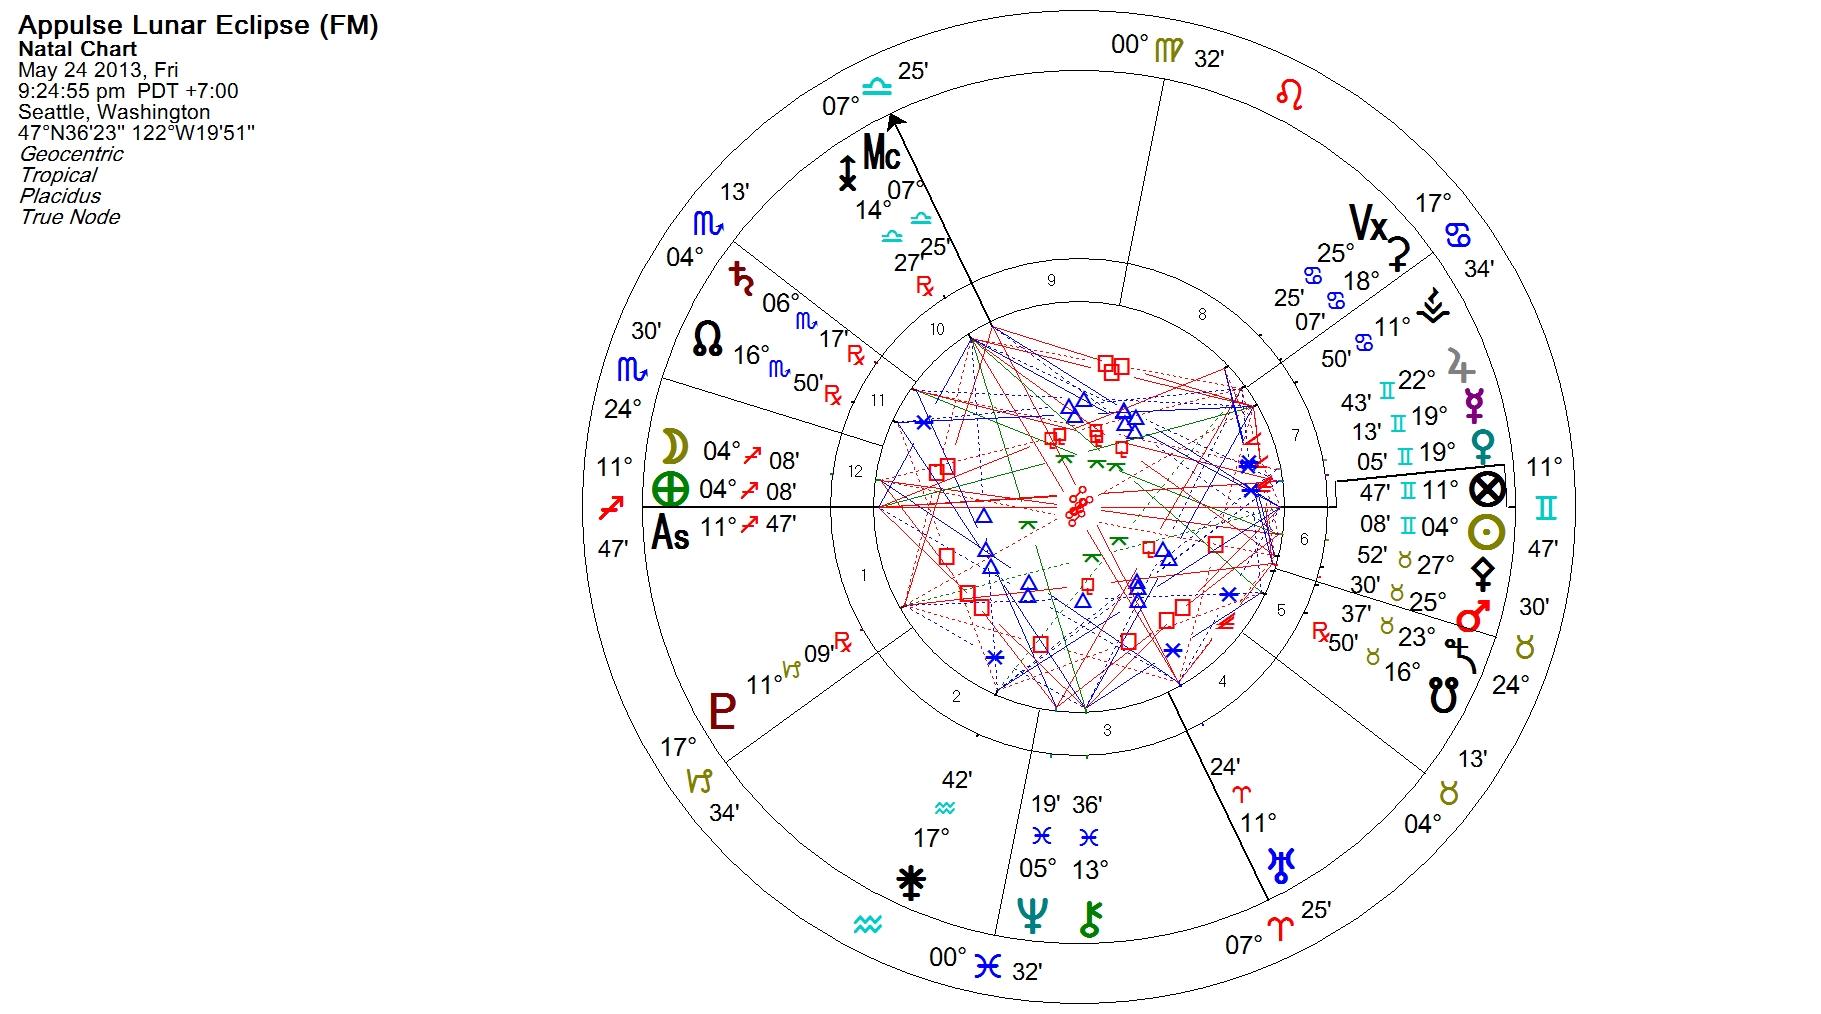 2013, 2013 Lunar Tables, Lunar Eclipse Chart, May 25 2013 Lunar